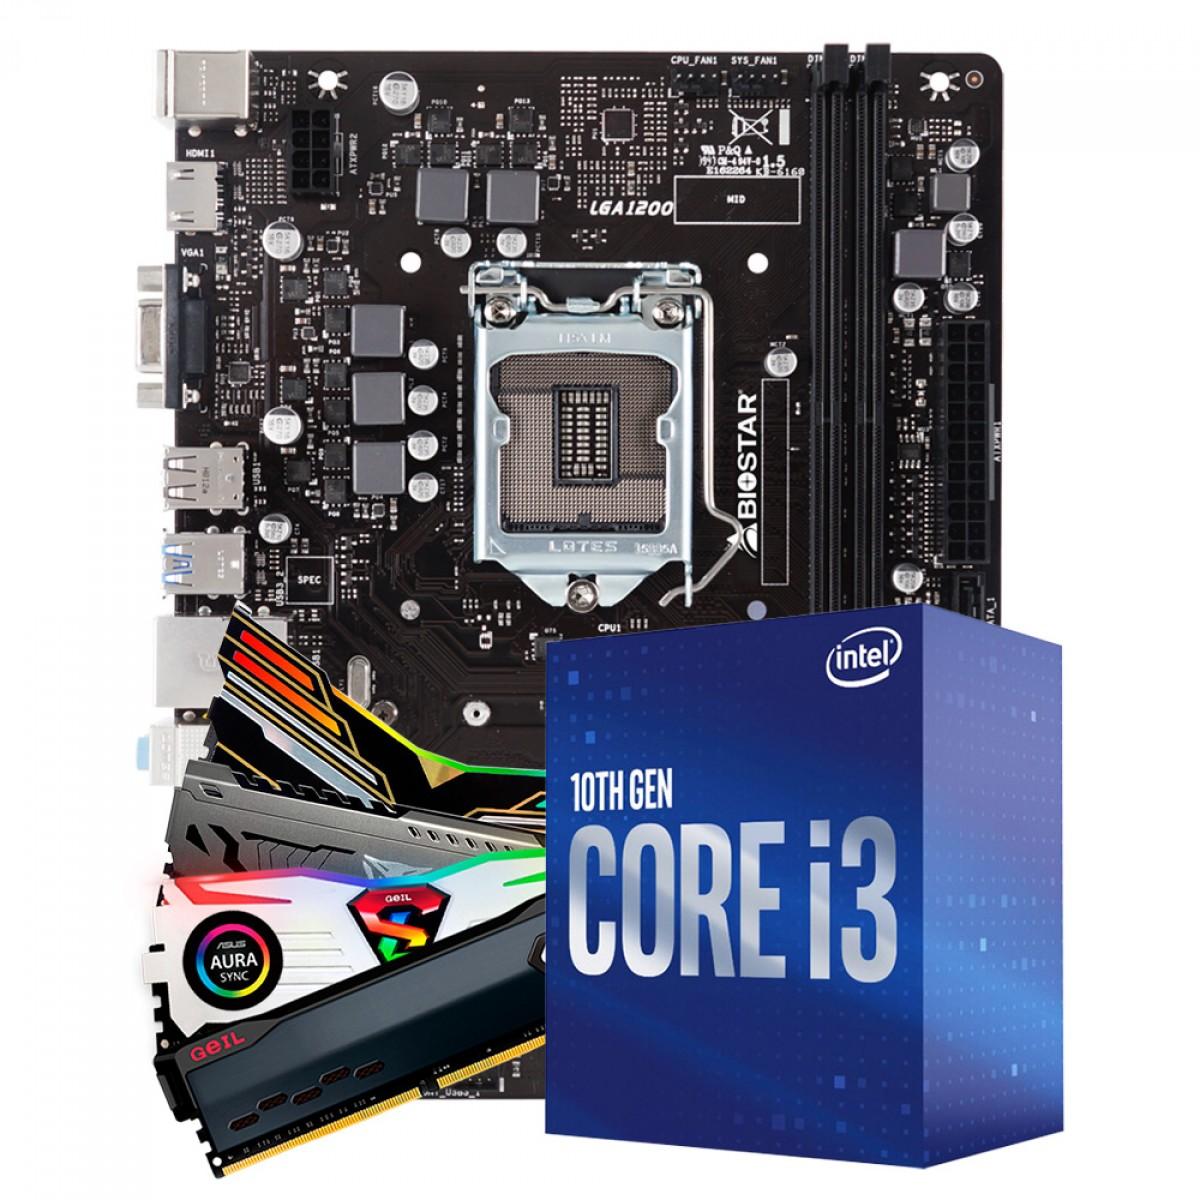 Kit Upgrade Biostar H410MH VER 6.0 + Intel Core i3 10105F + Memória DDR4 8GB 3000MHz